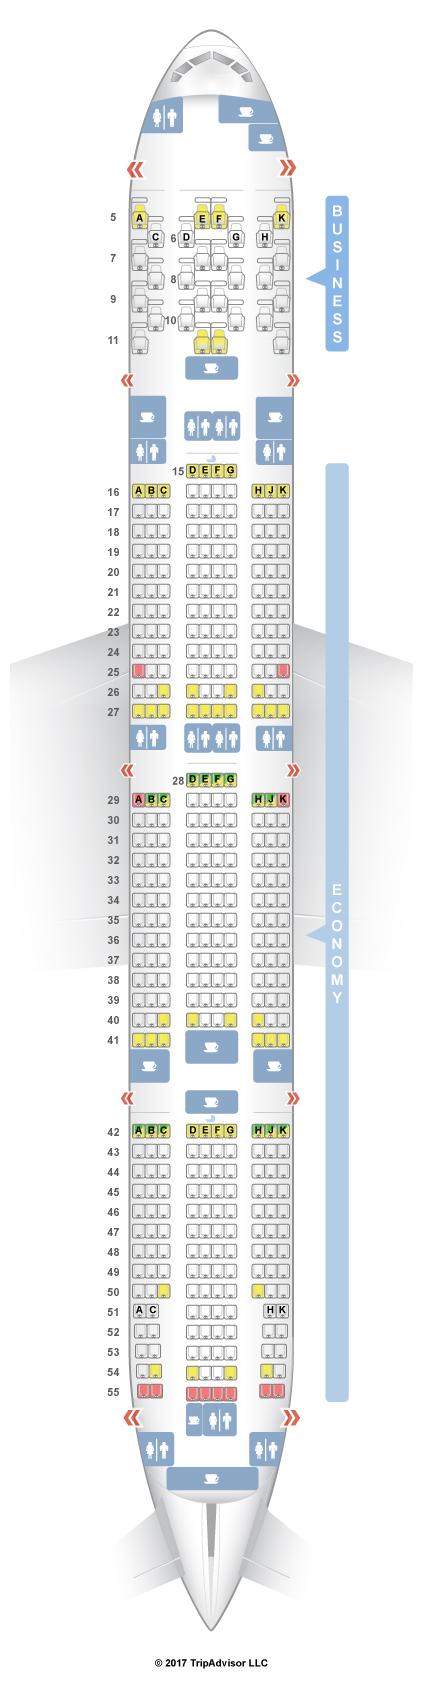 SeatGuru Seat Map Etihad Boeing 777-300ER (77W) Two Class V1 - photo#30